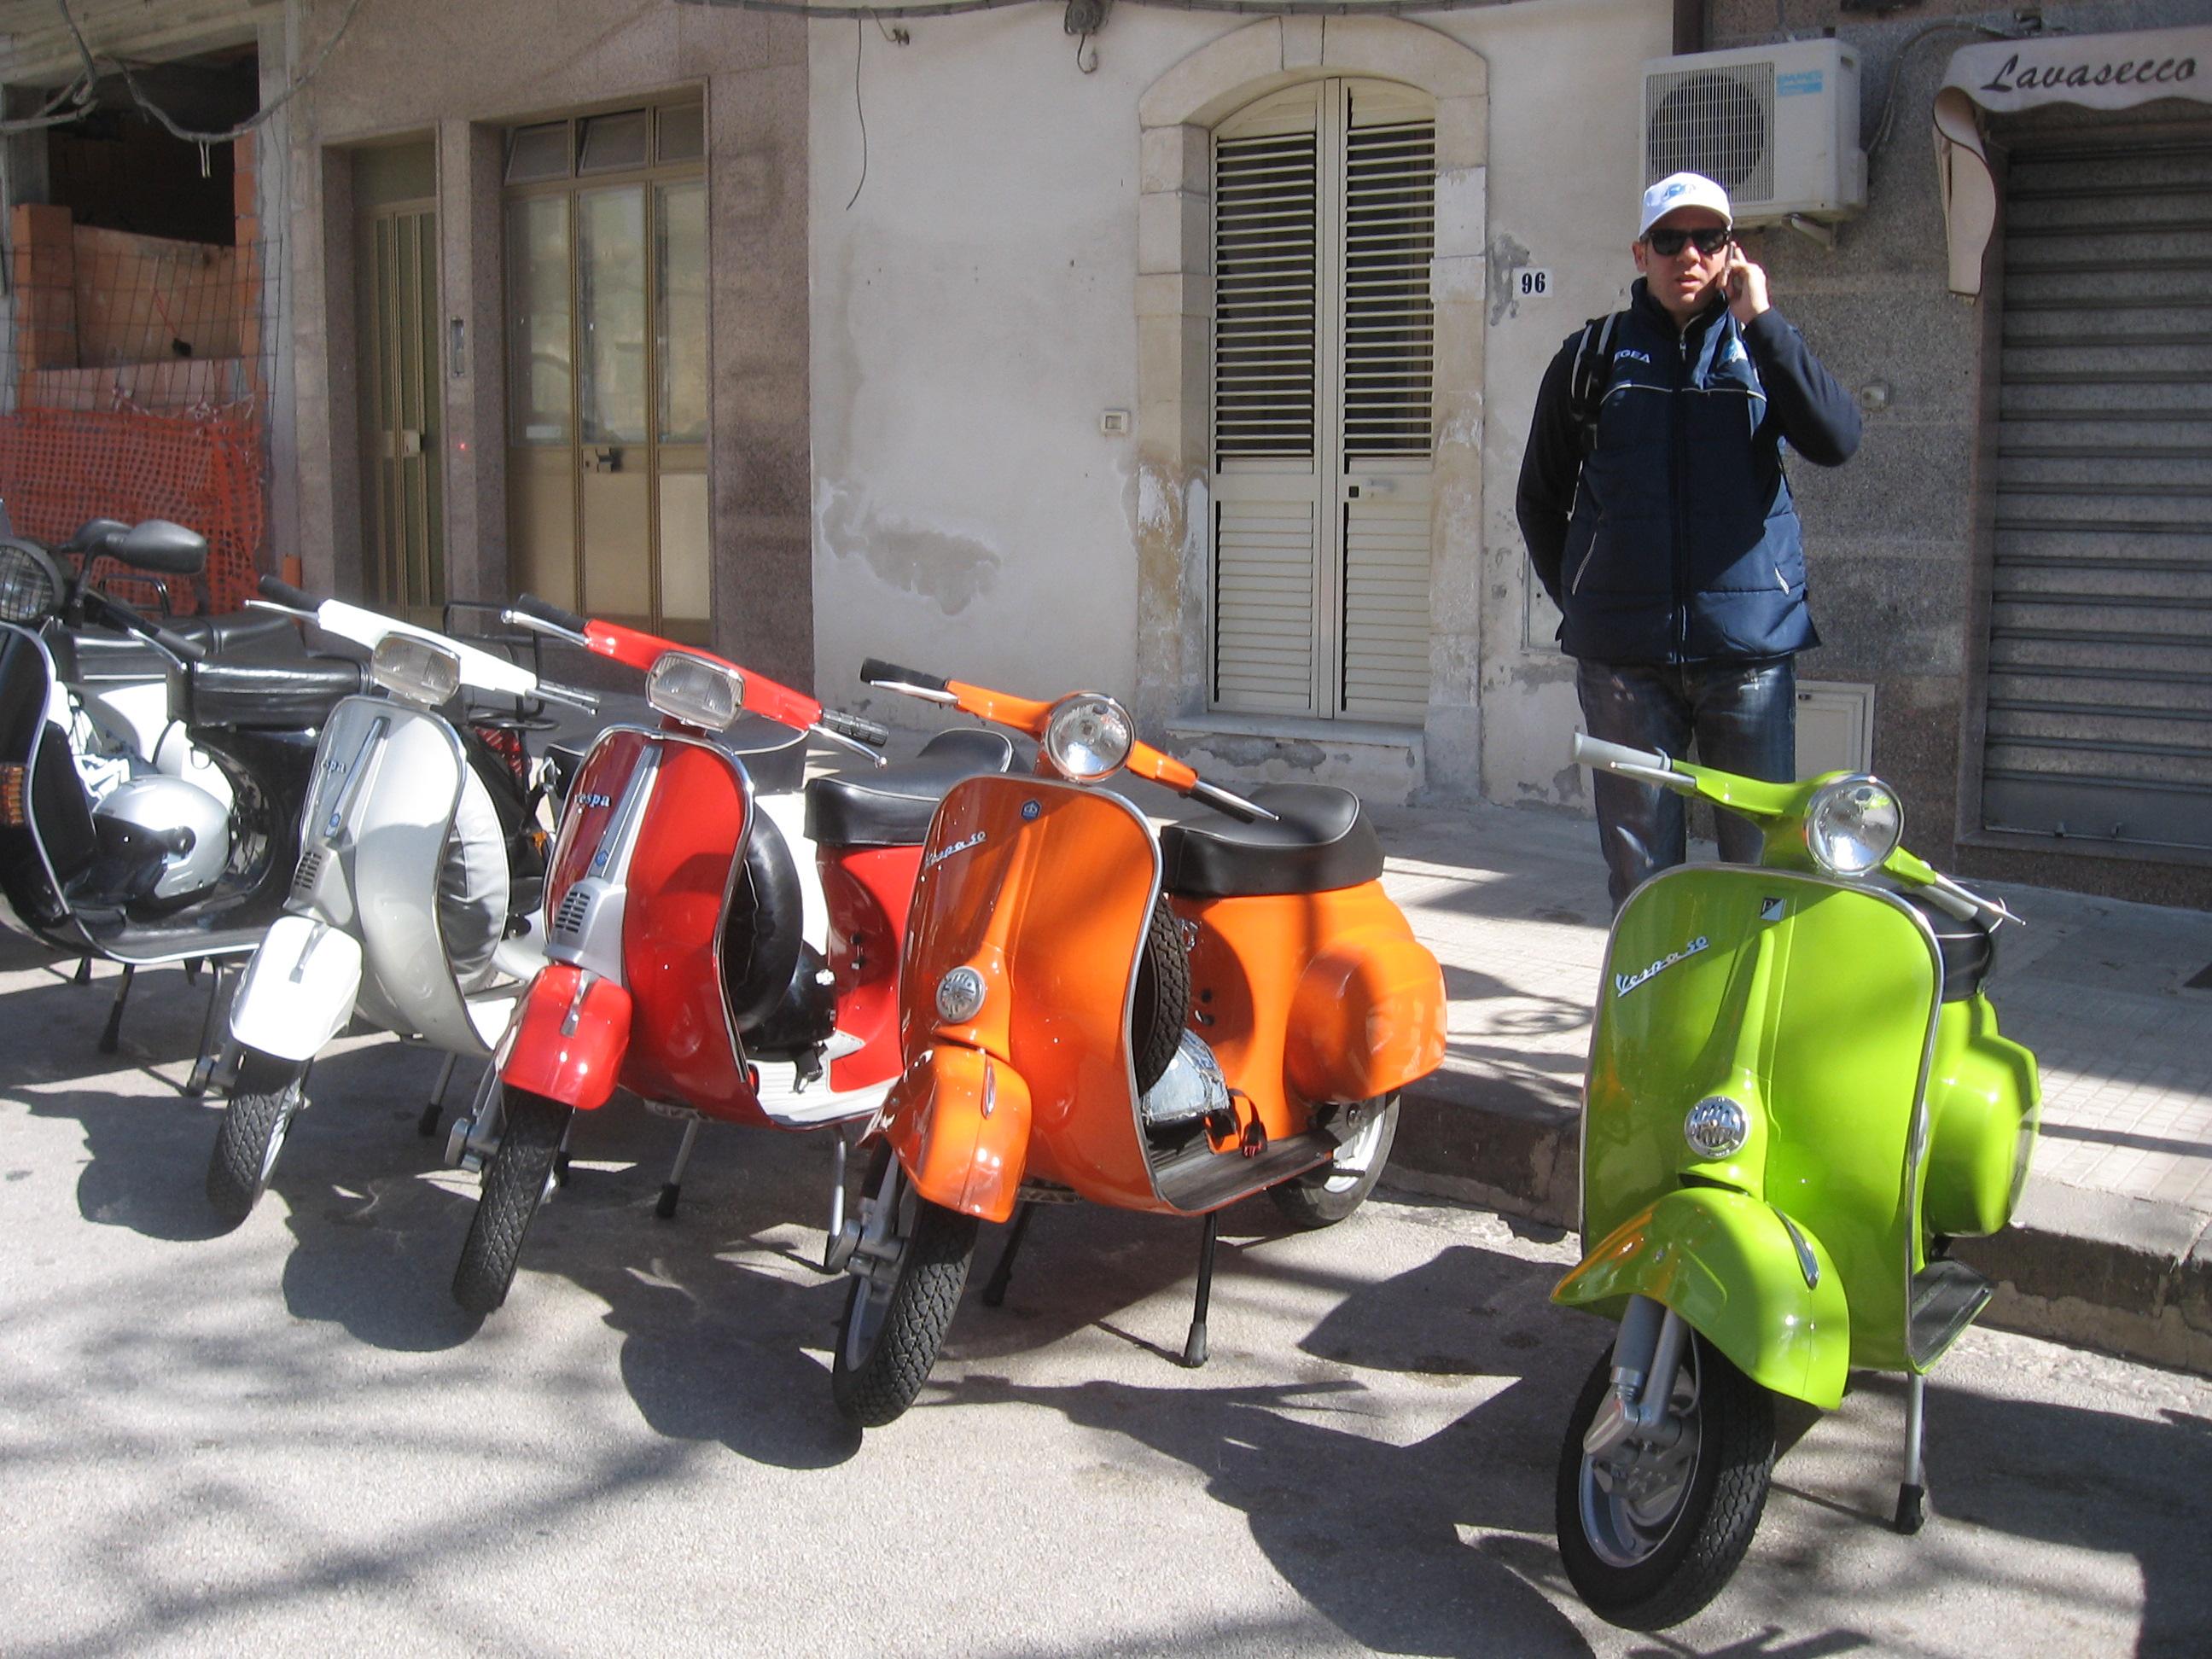 SAN MICHELE – MOTORADUNO A VILLASMUNDO